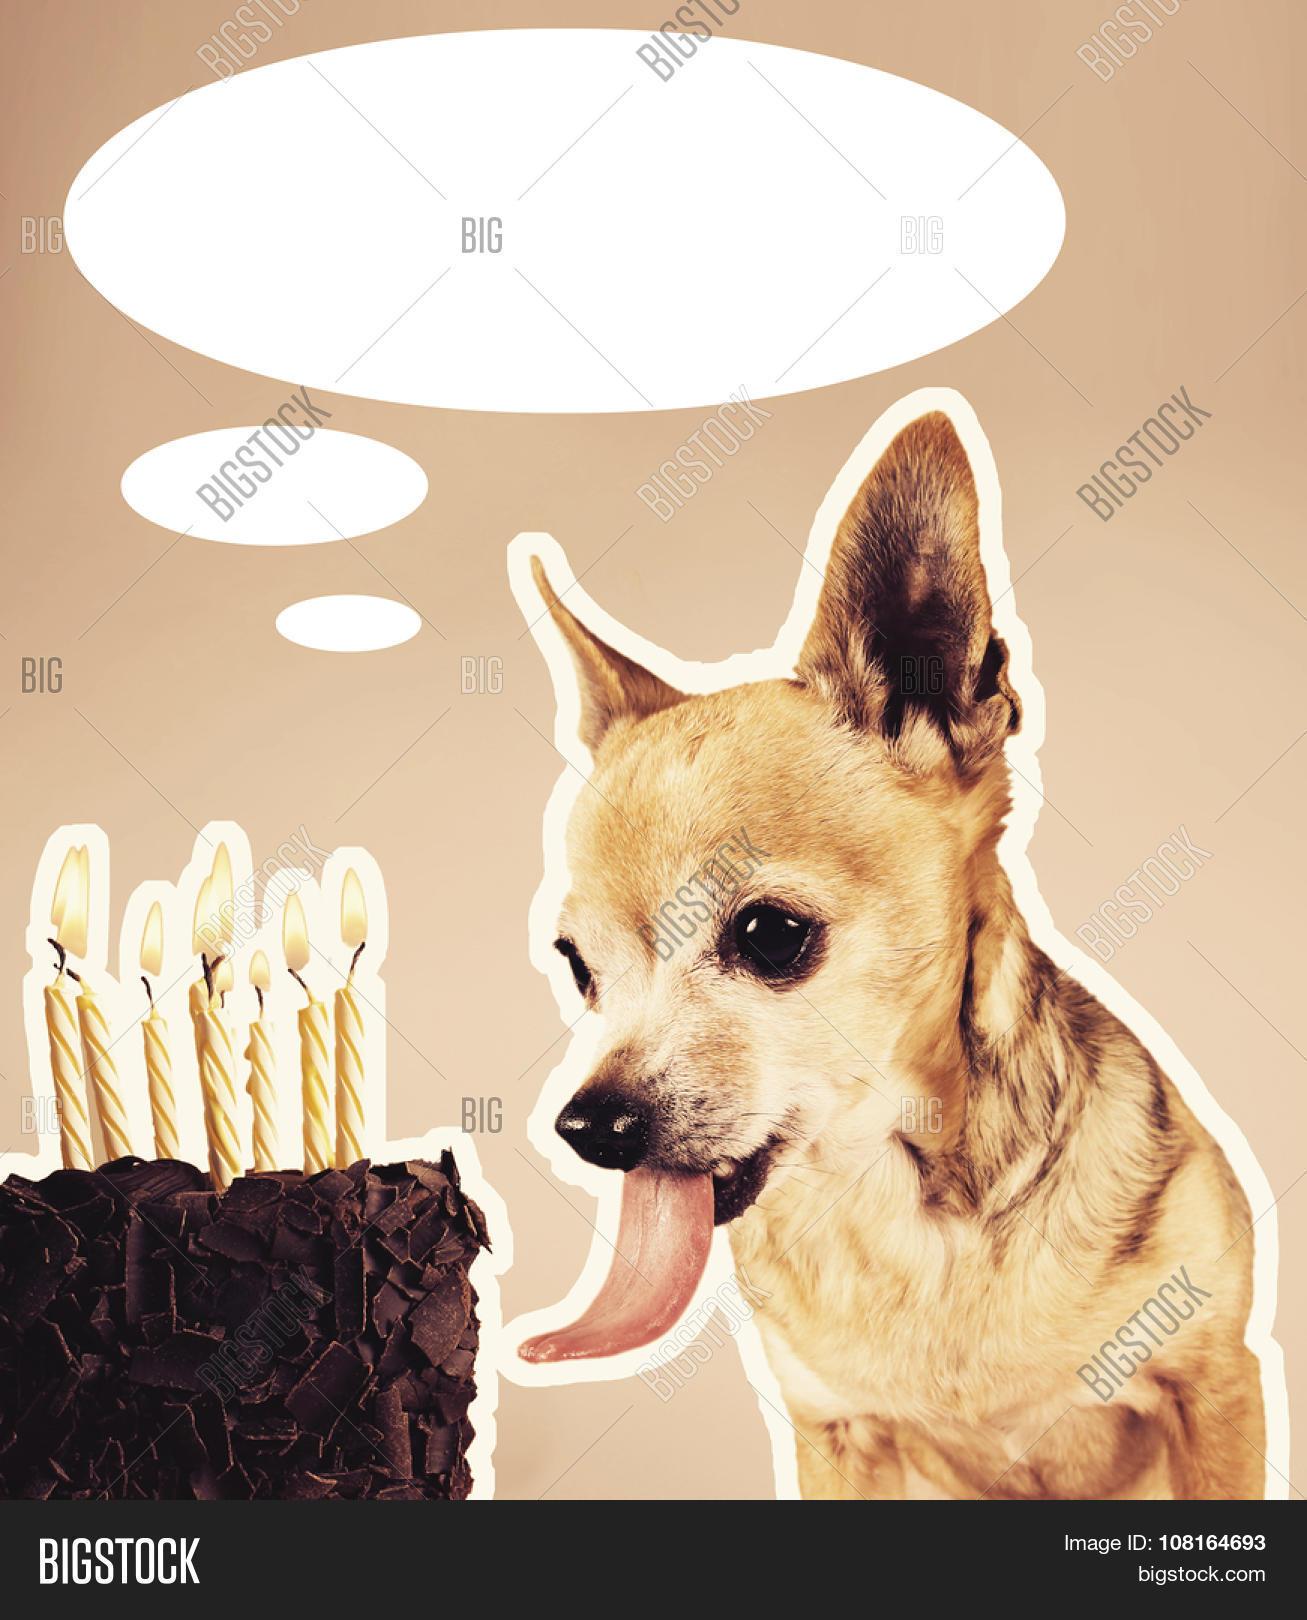 Phenomenal Chihuahua Licking Image Photo Free Trial Bigstock Funny Birthday Cards Online Unhofree Goldxyz